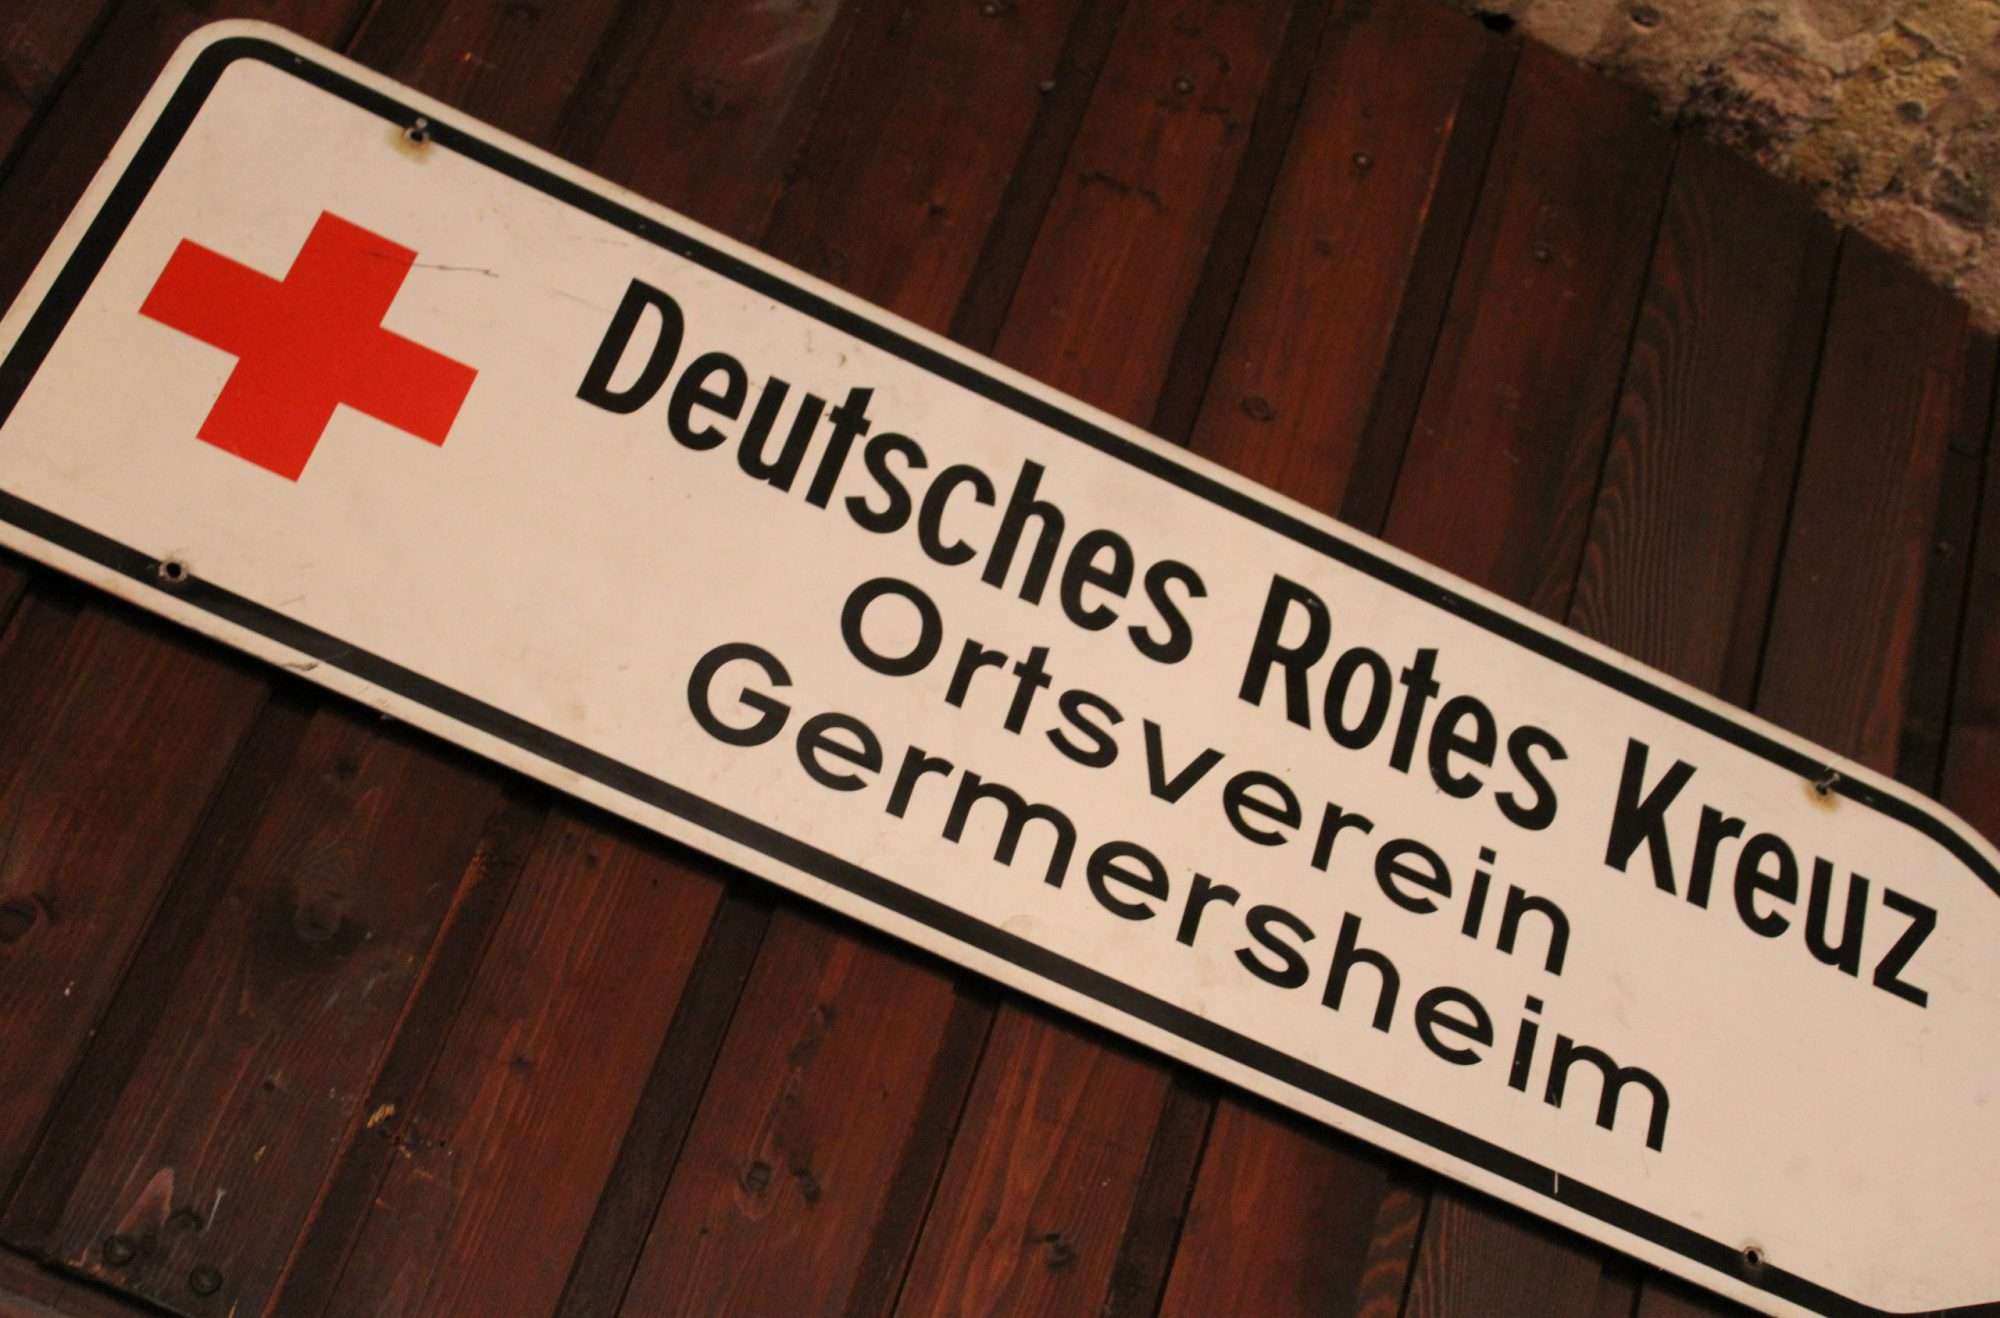 DRK Ortsverein Germersheim